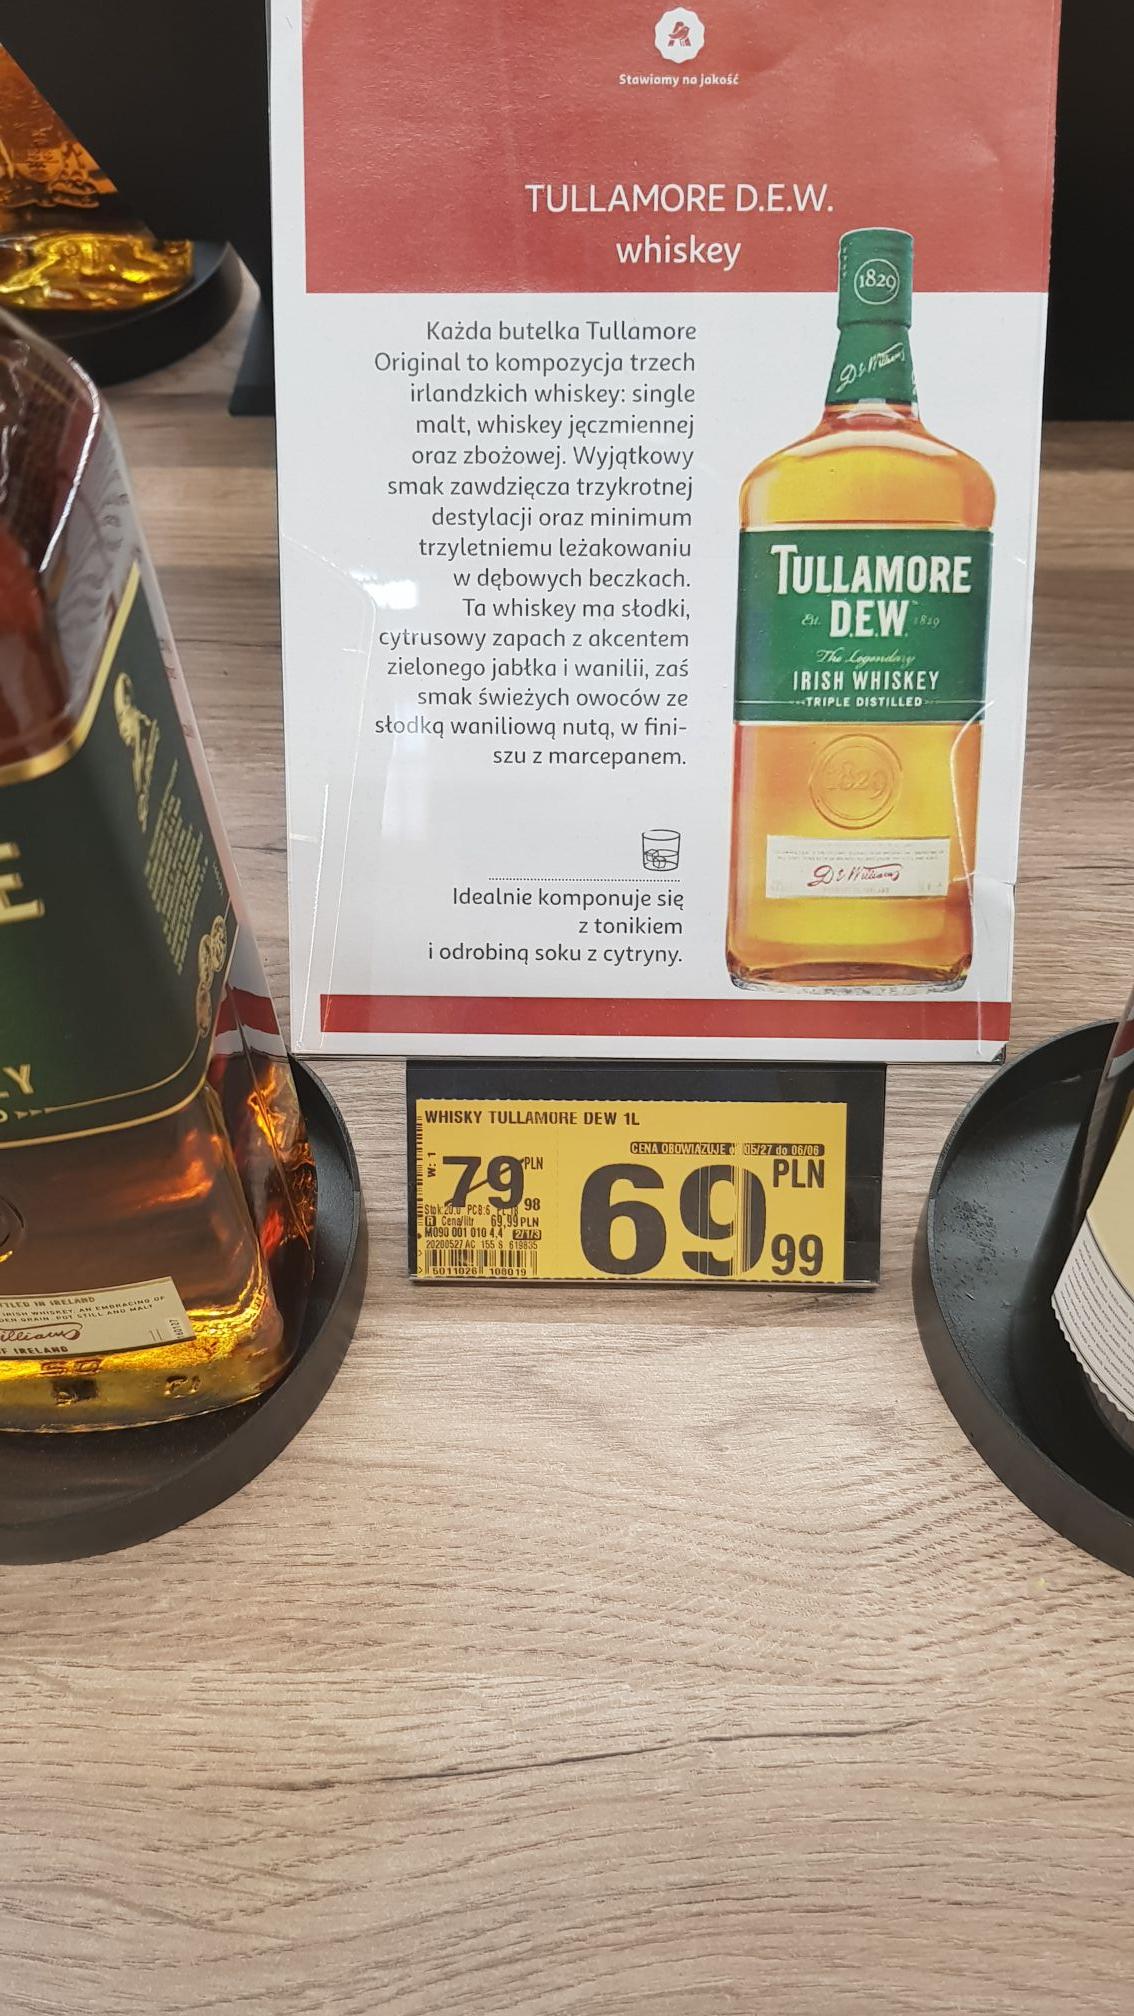 Whiskey Tullamore Dew 1 litr Auchan (Białystok)